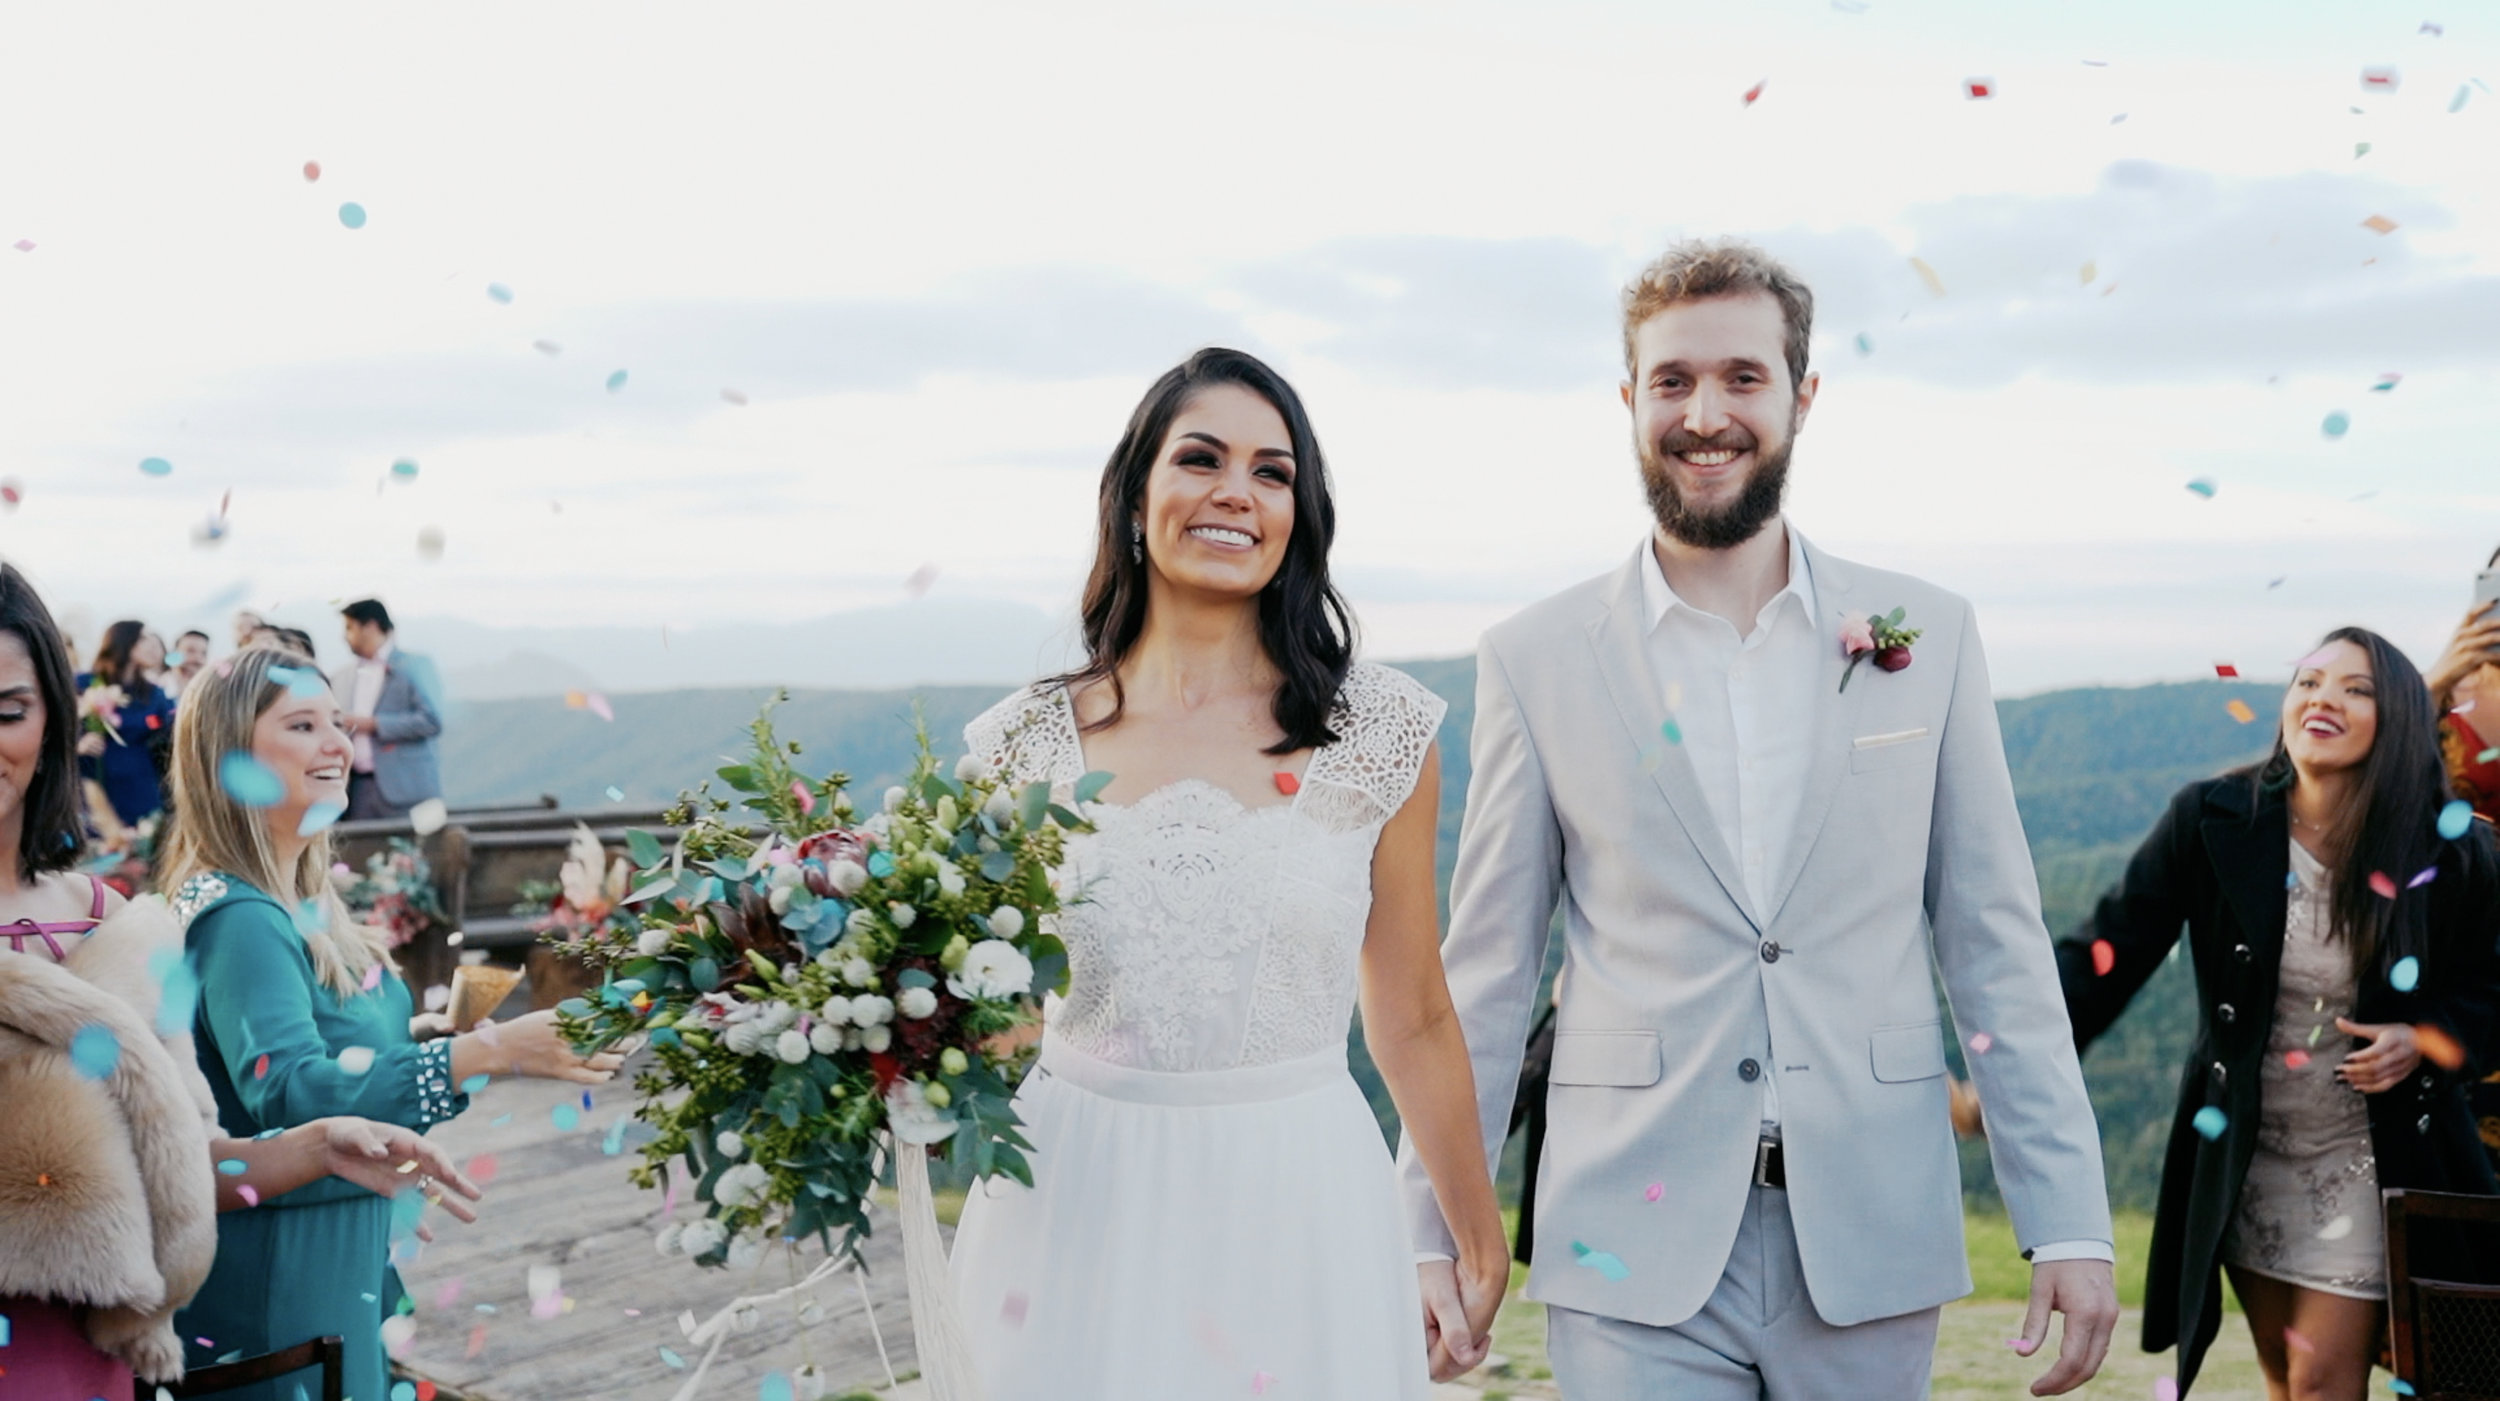 photographe-bruxelles-mariage-nicolasleleu.jpg